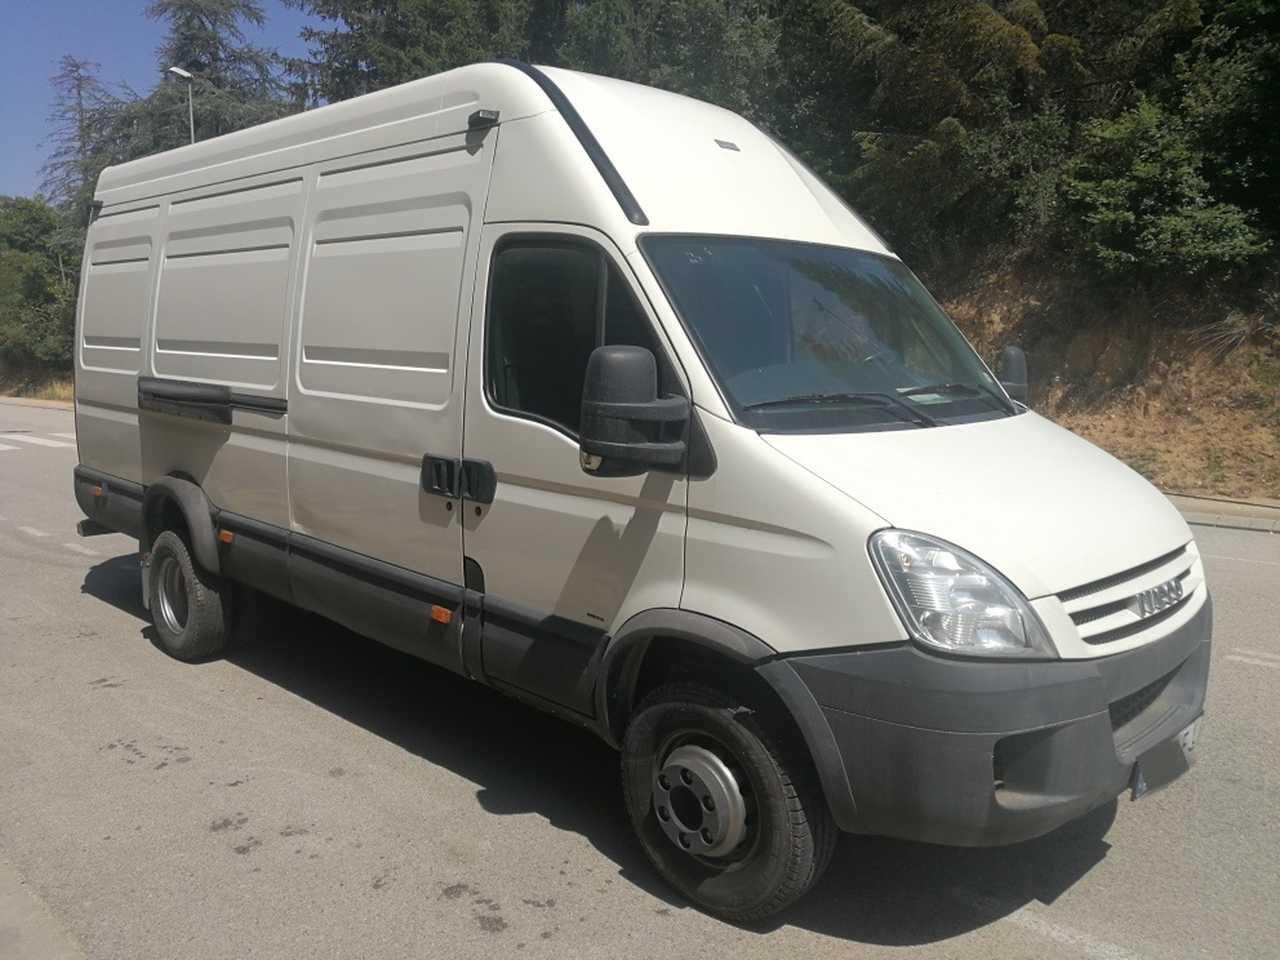 Iveco Daily 65c18 furgon gran volumen l4h4   - Foto 1